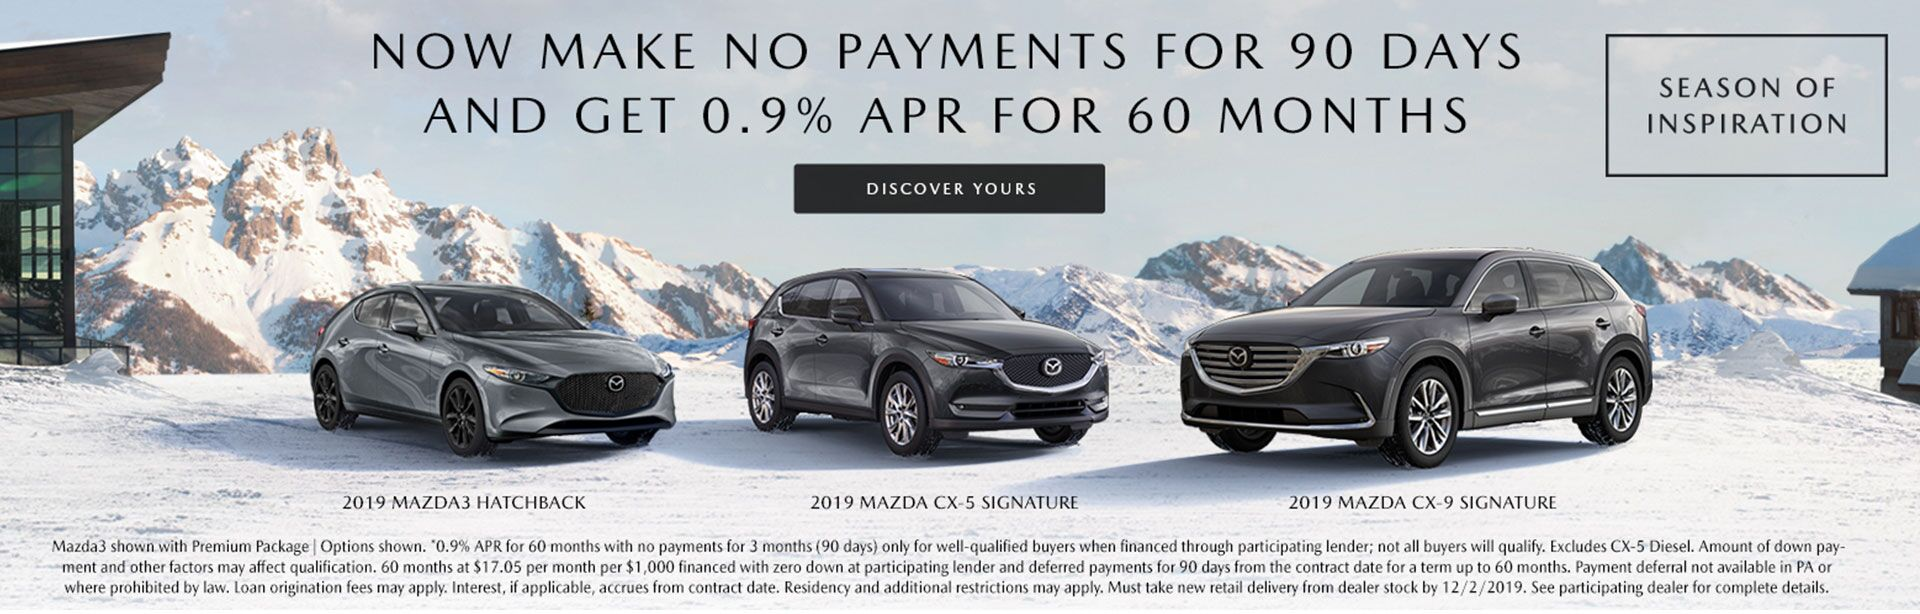 Mazda Dealerships In Georgia >> Mazda Dealership Amarillo Tx Used Cars Fenton Mazda Of